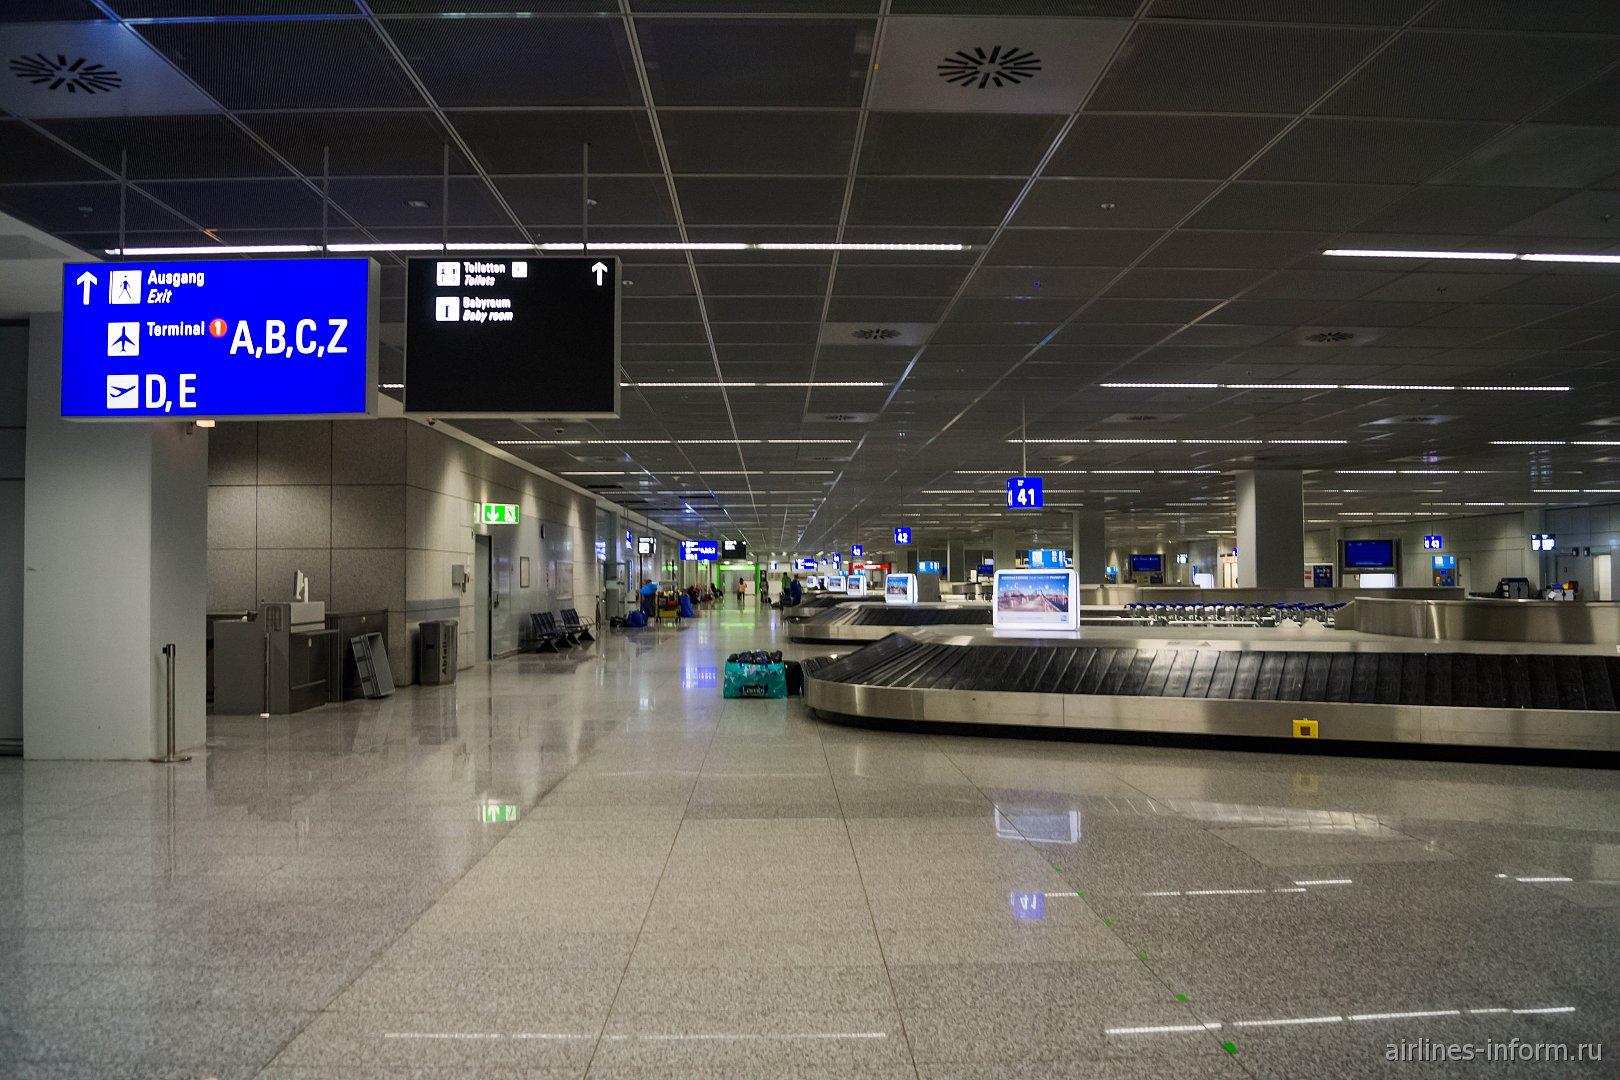 Зал выдачи багажа в терминале 2 аэропорта Франкфурт-на-Майне